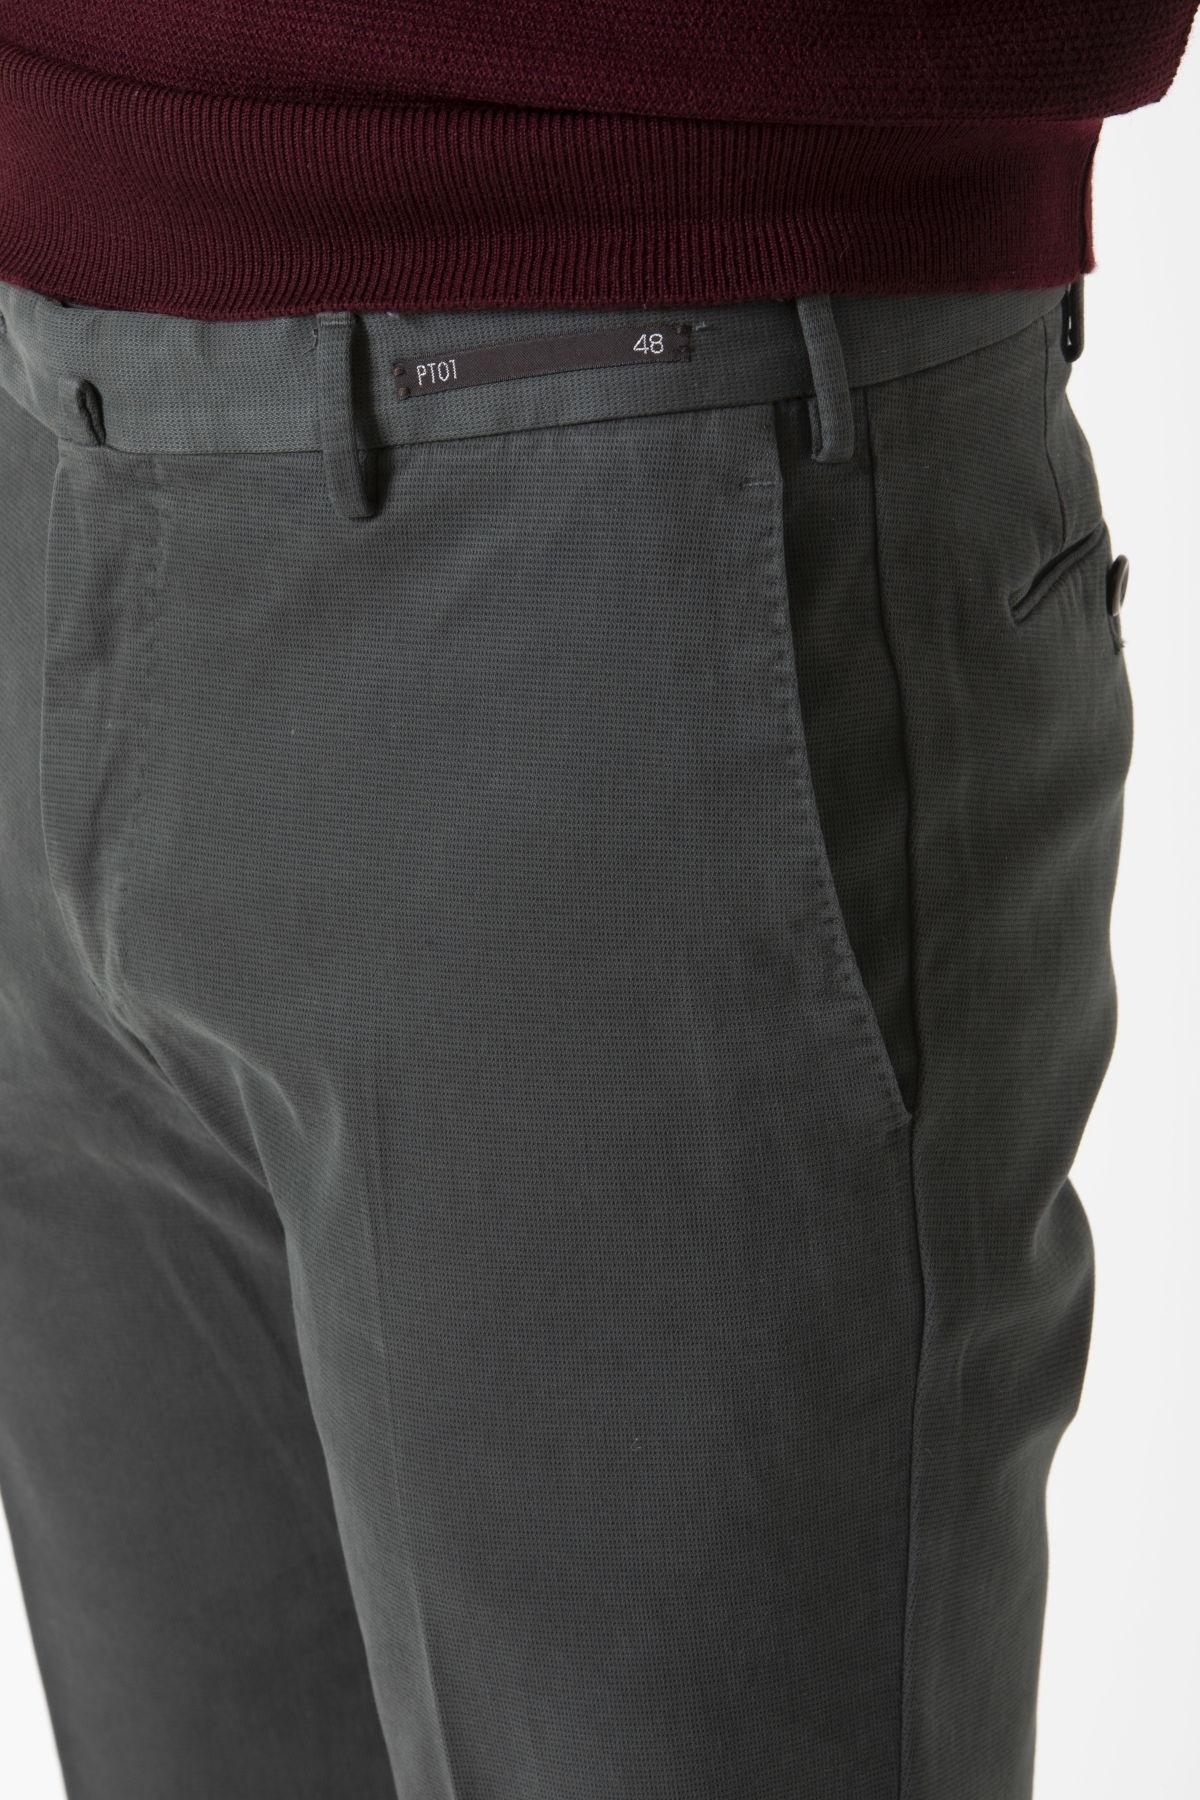 Pantaloni BUSINESS per uomo PT01 A/I 19-20